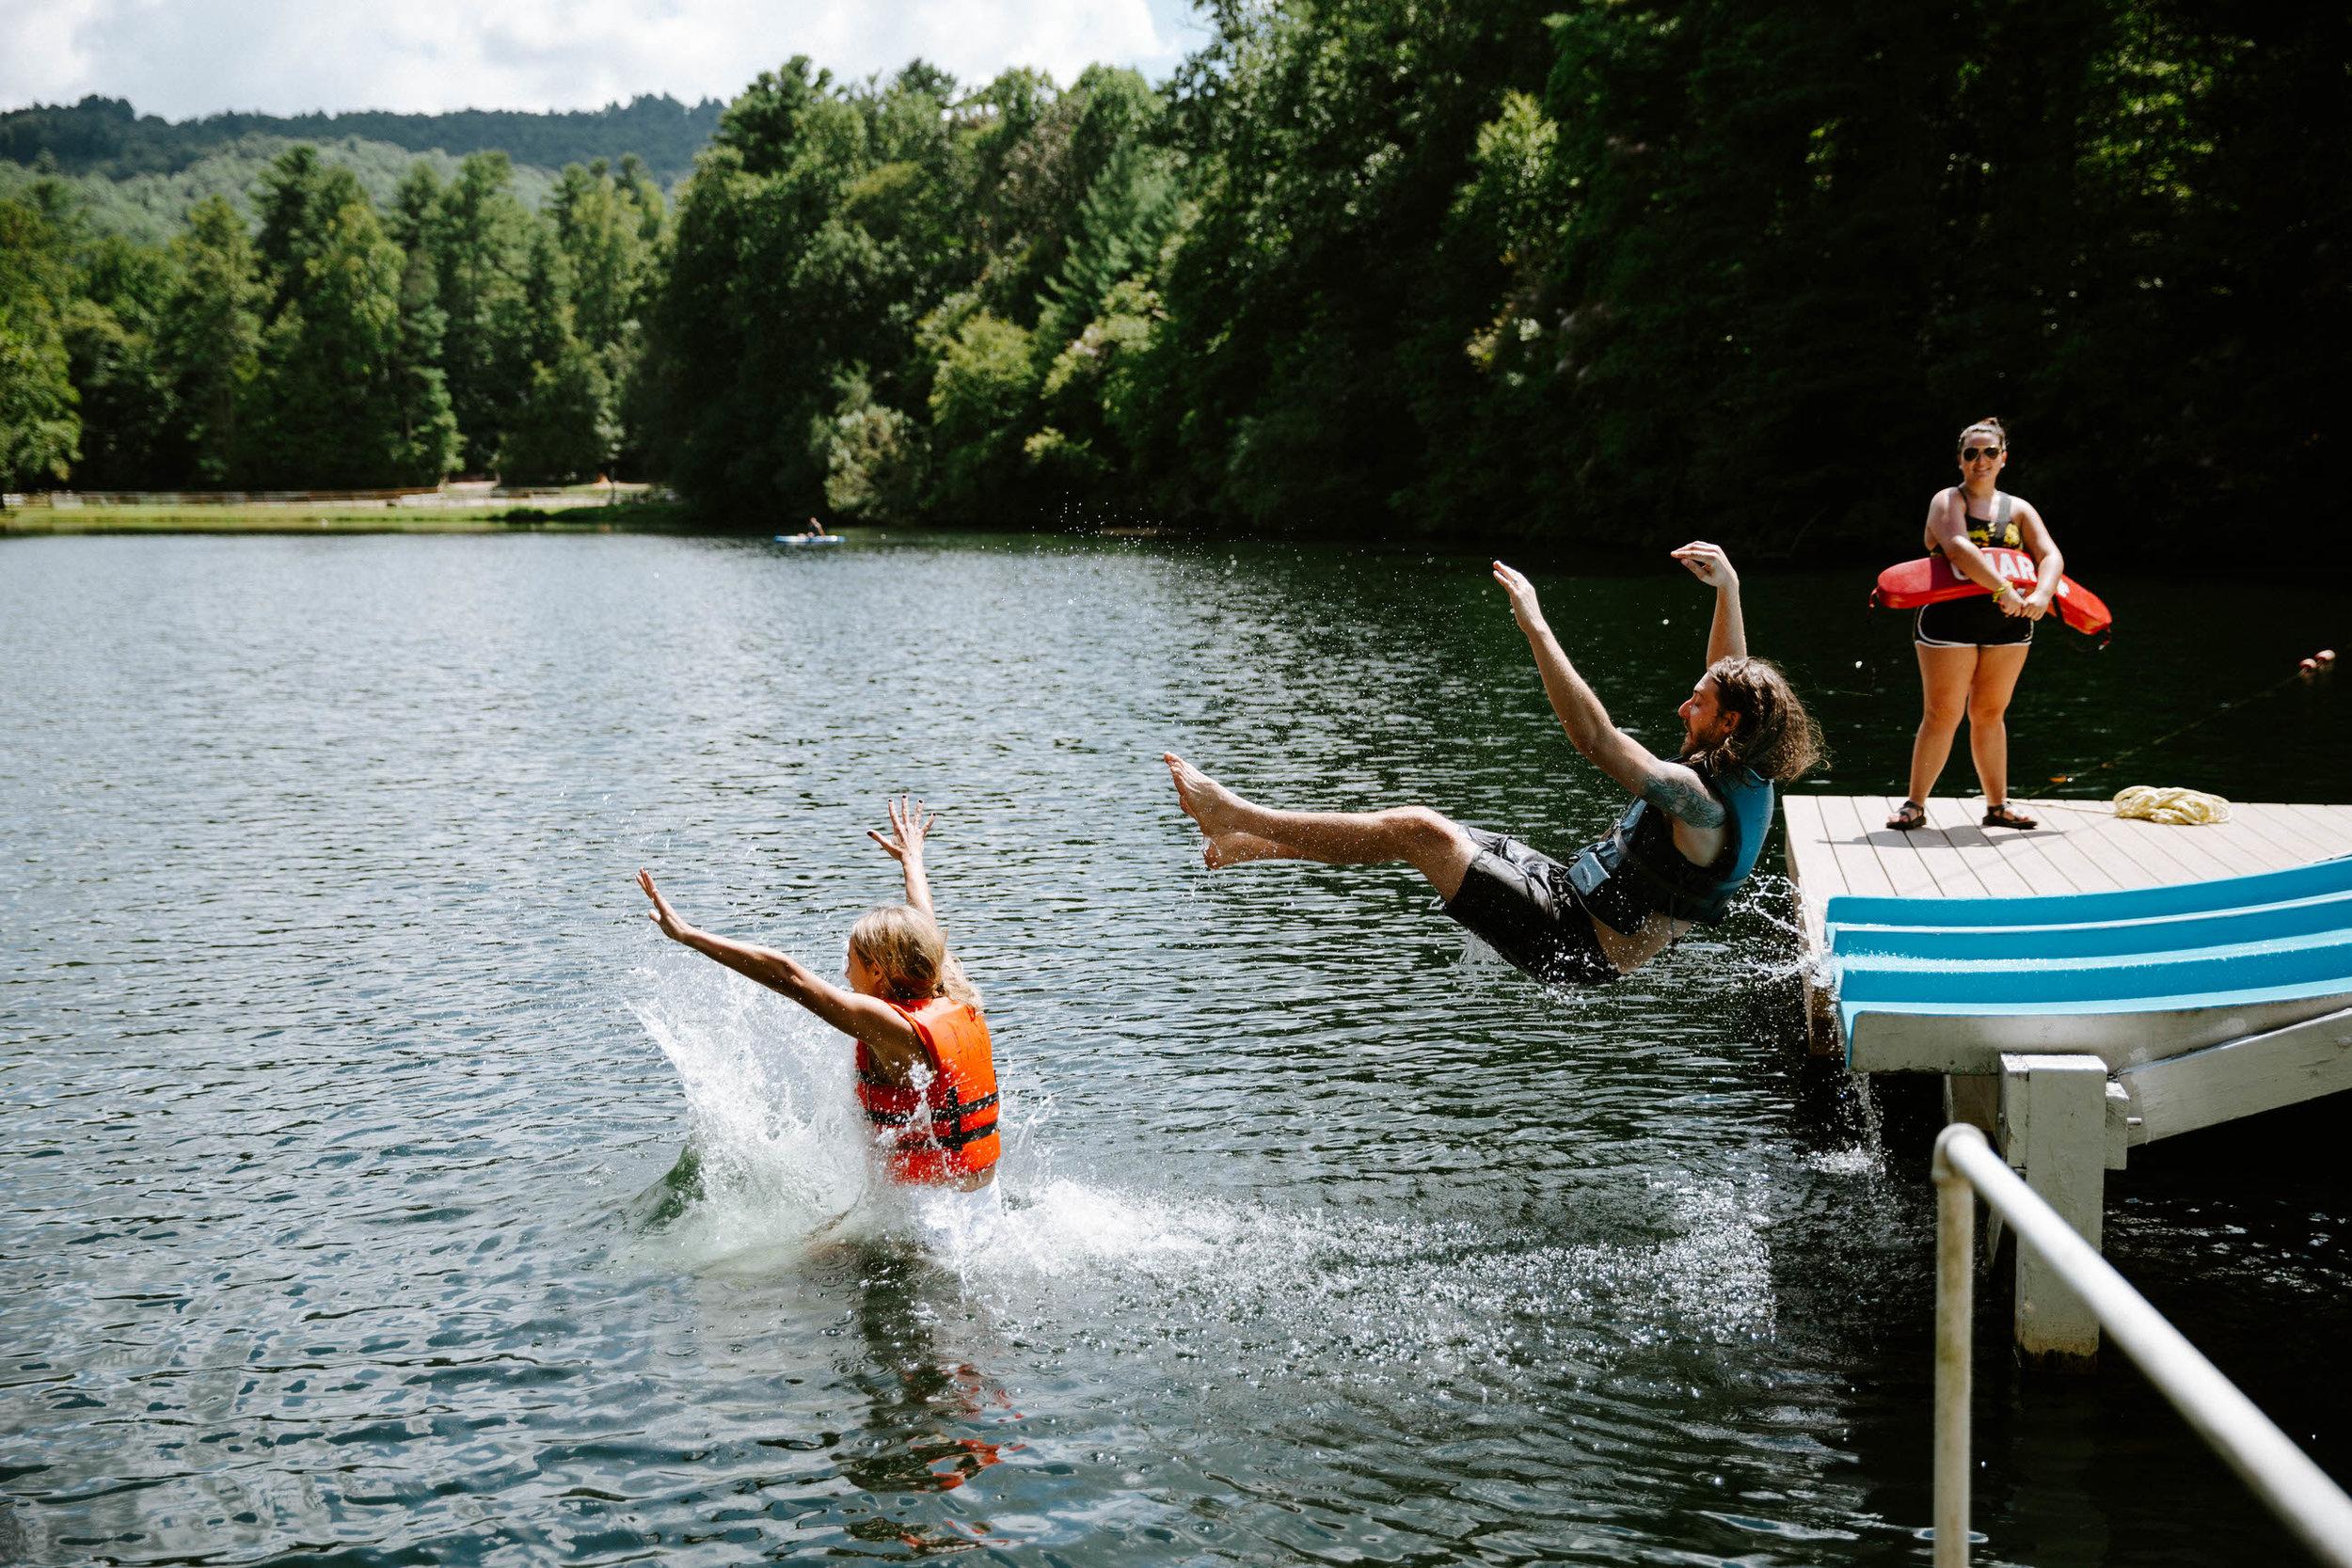 jeremy+elle-Lake-0903.jpg